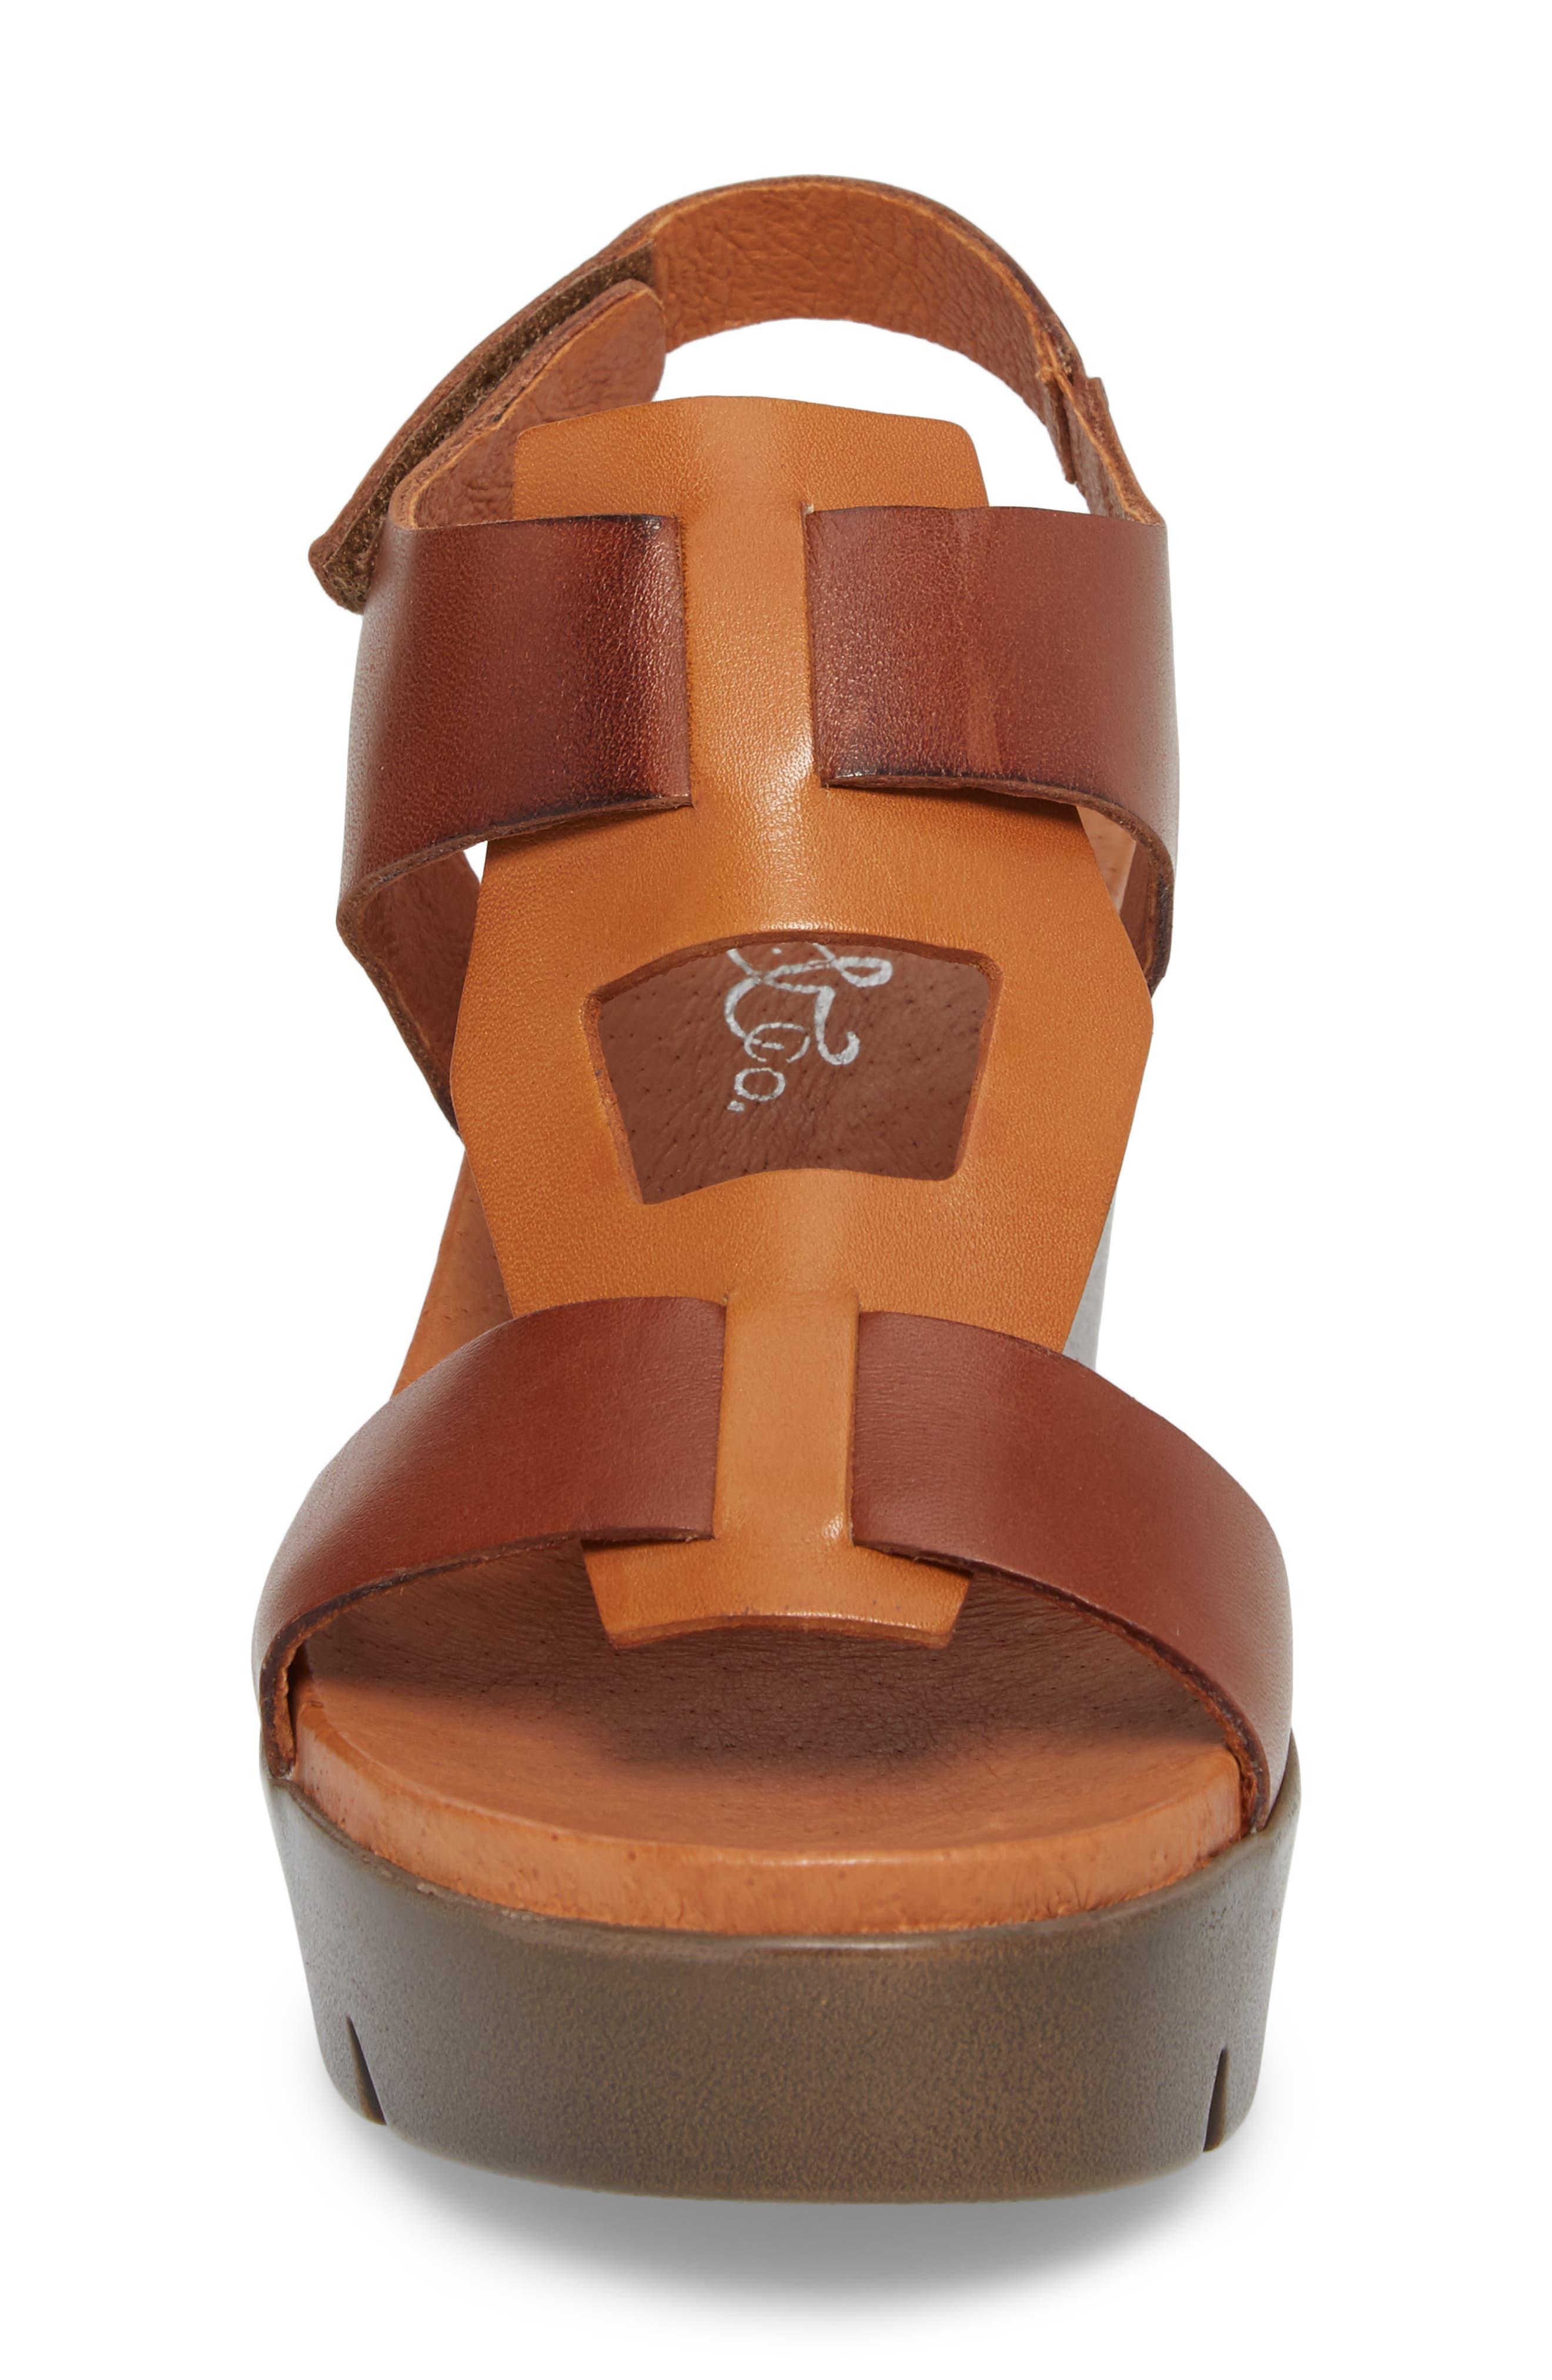 Somo Platform Wedge Sandal,                             Alternate thumbnail 4, color,                             Cognac/ Camel Leather